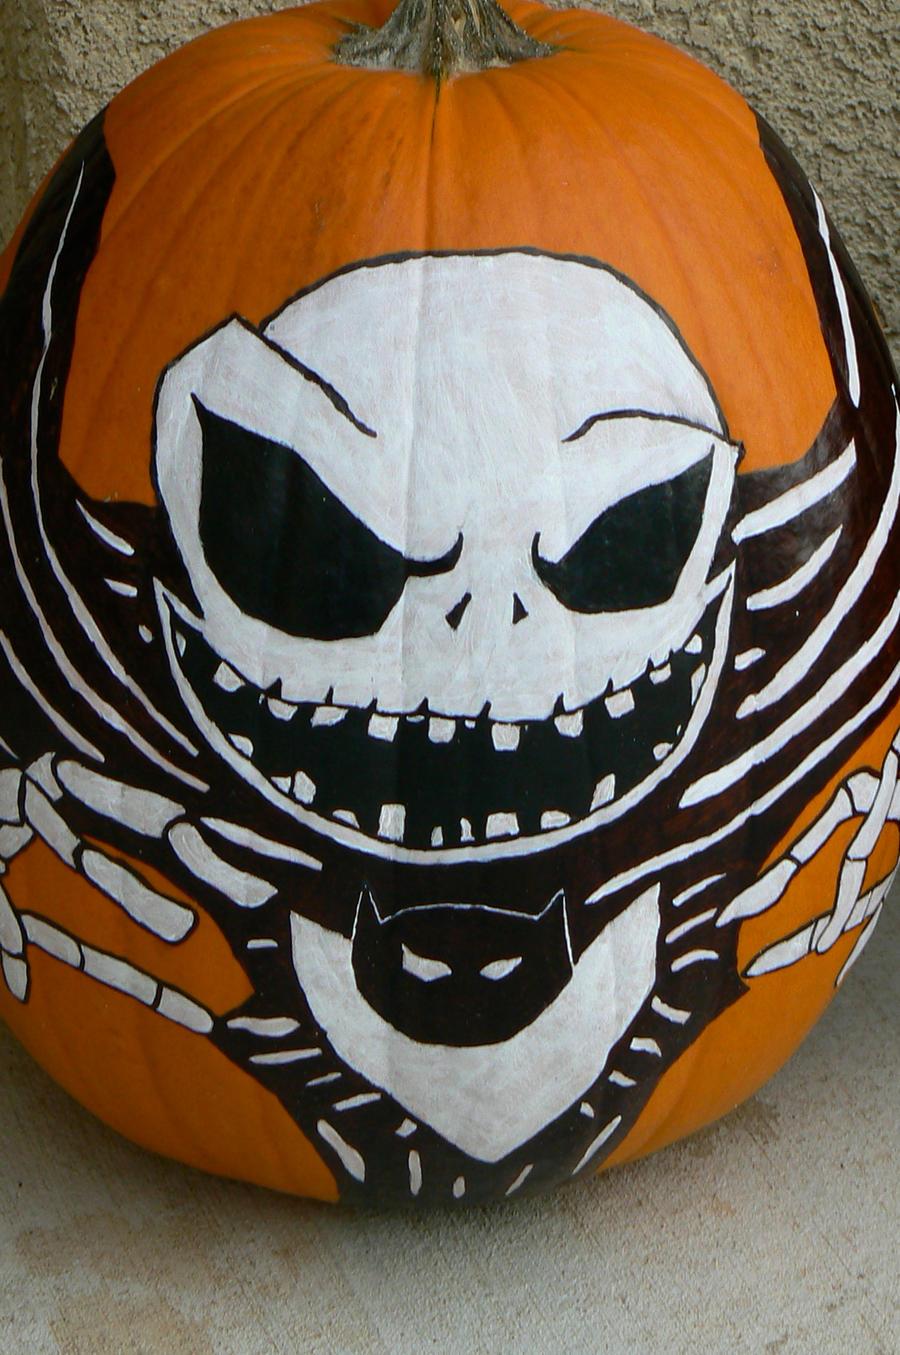 Jack Skellington Pumpkin King by FairieChick on DeviantArt